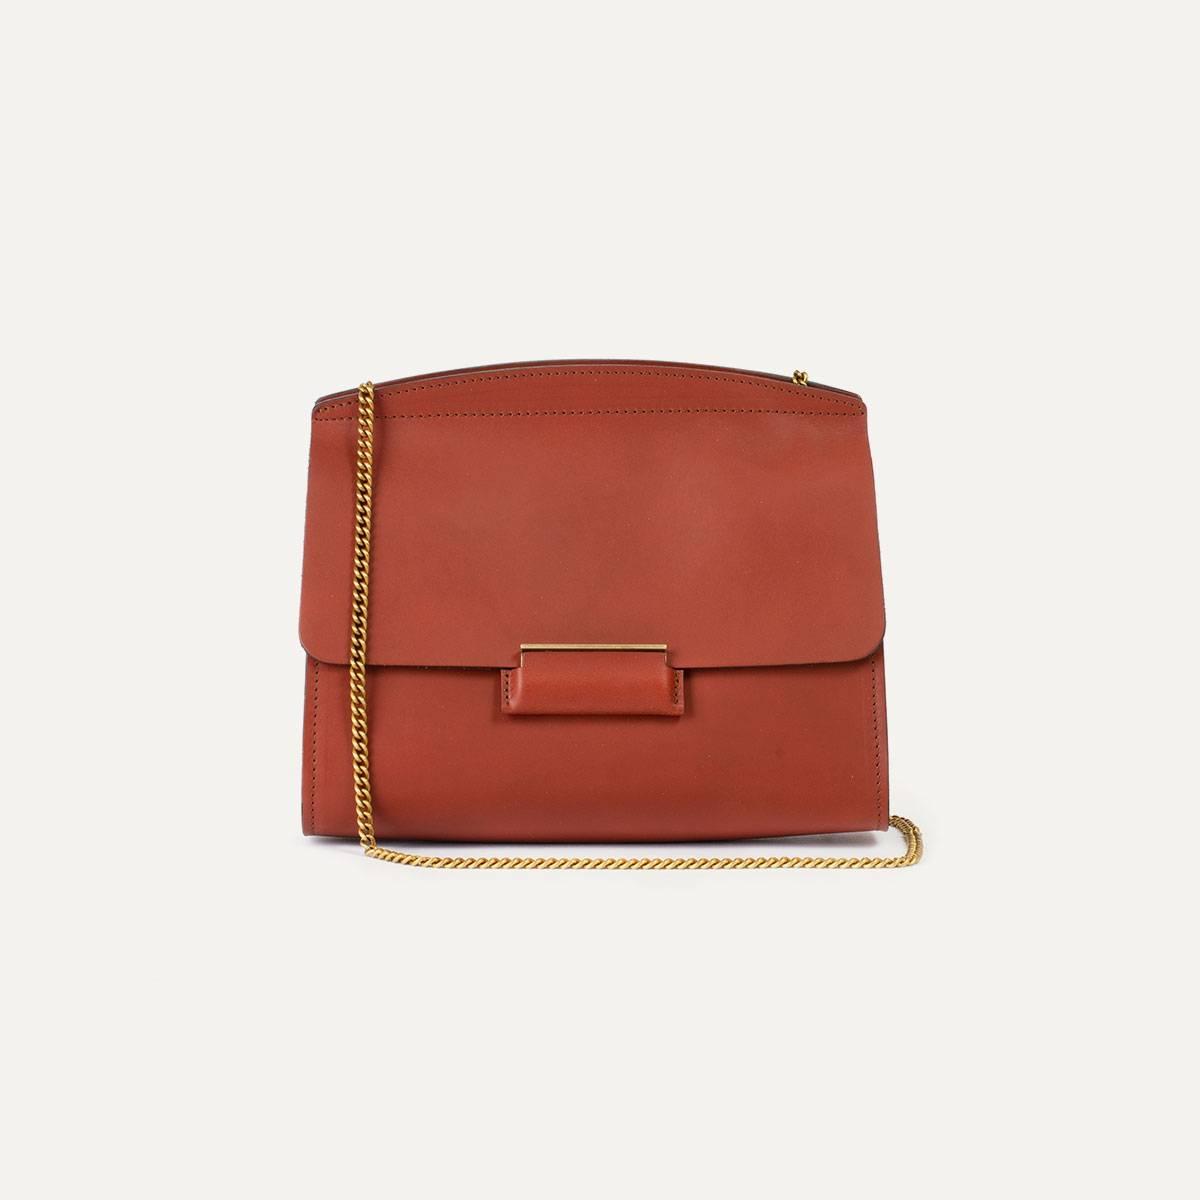 Origami S clutch bag - Rust (image n°5)